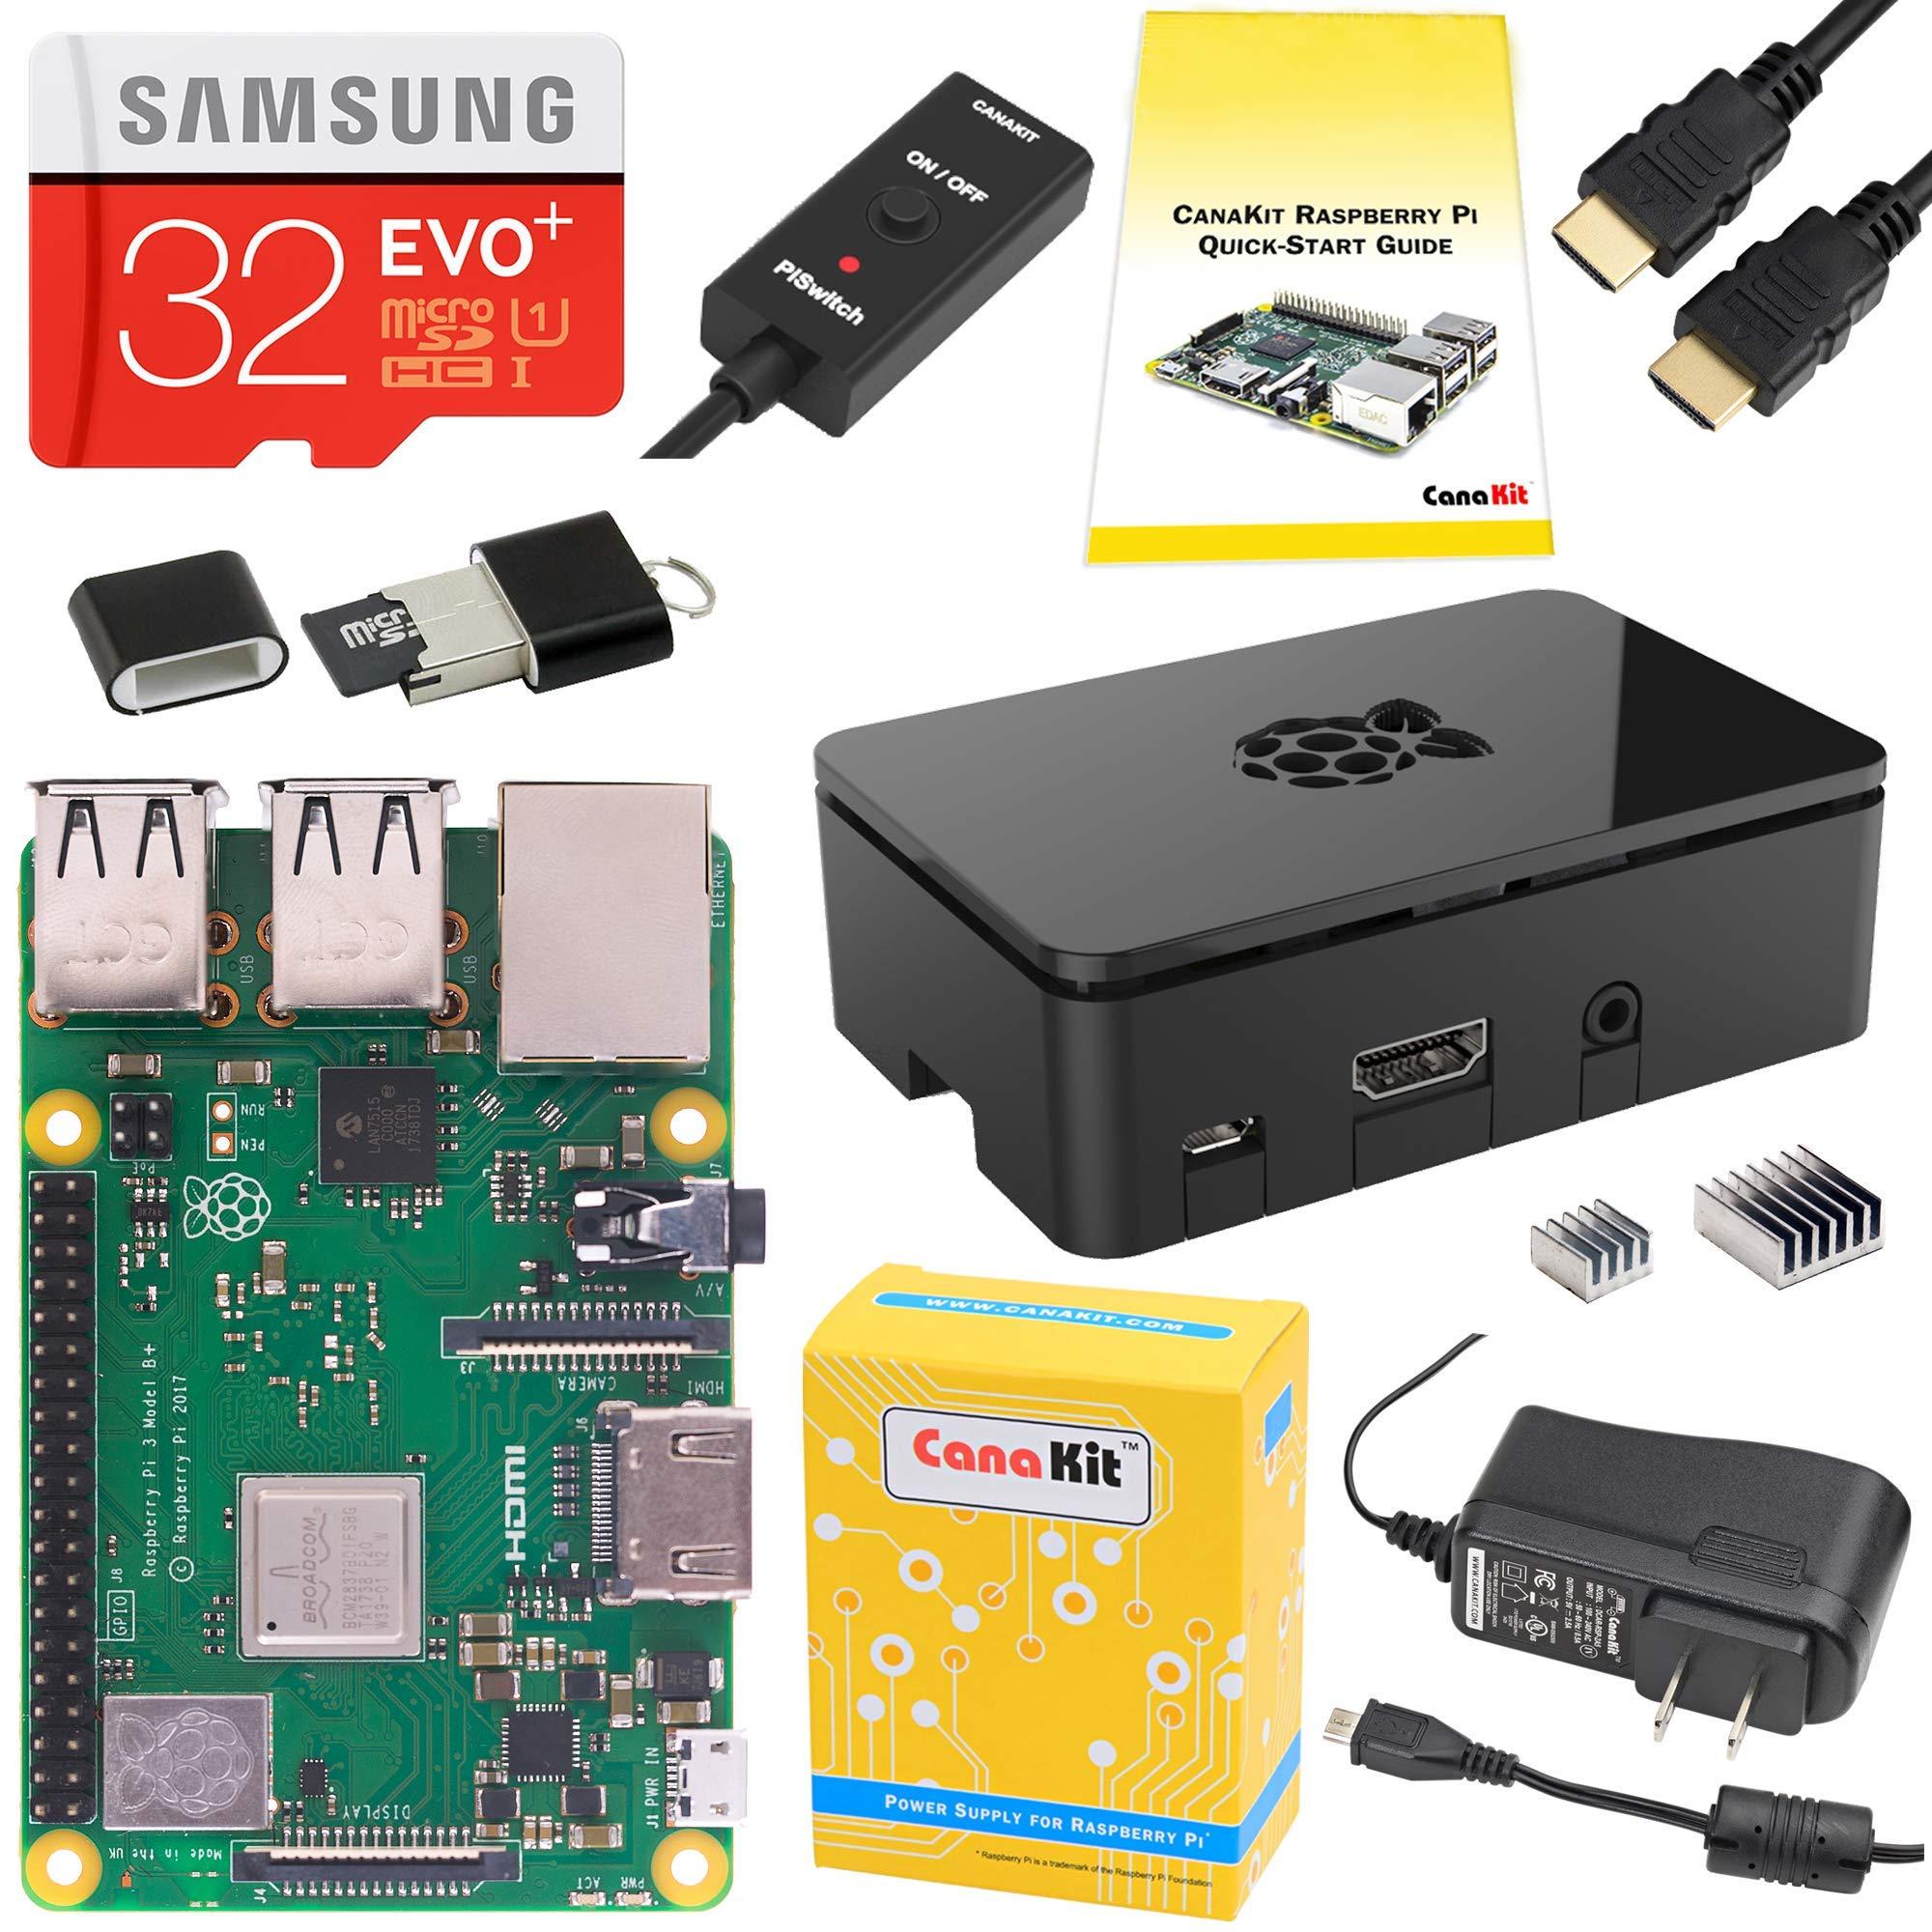 CanaKit Raspberry Pi 3 B+ (B Plus) Starter Kit (32 GB EVO+ Edition, Premium Black Case) by CanaKit